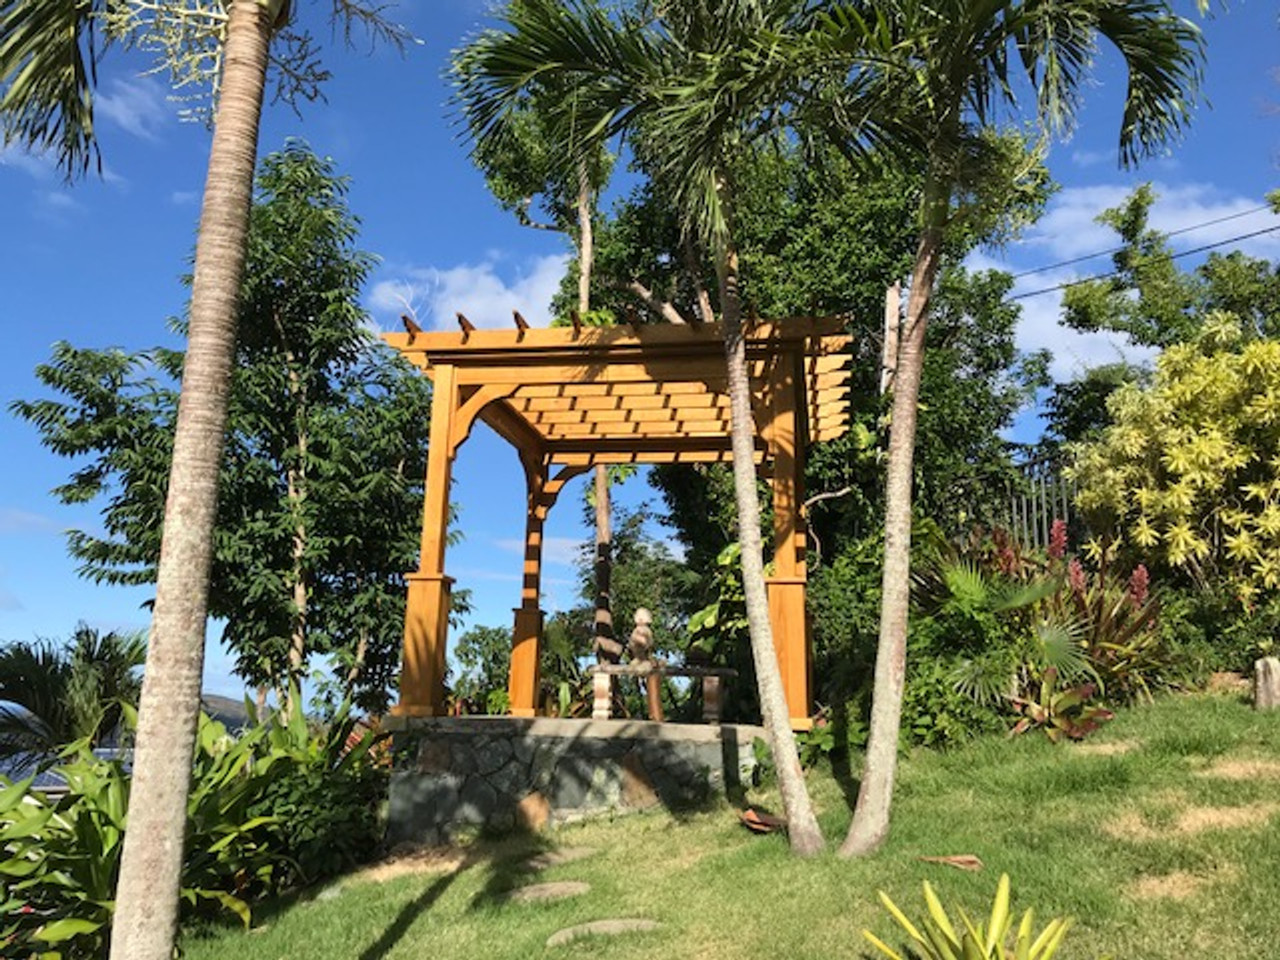 10x10 Pressure Treated Pine Serenity Pergola Kit, Beautiful in the U.S. Virgin Islands